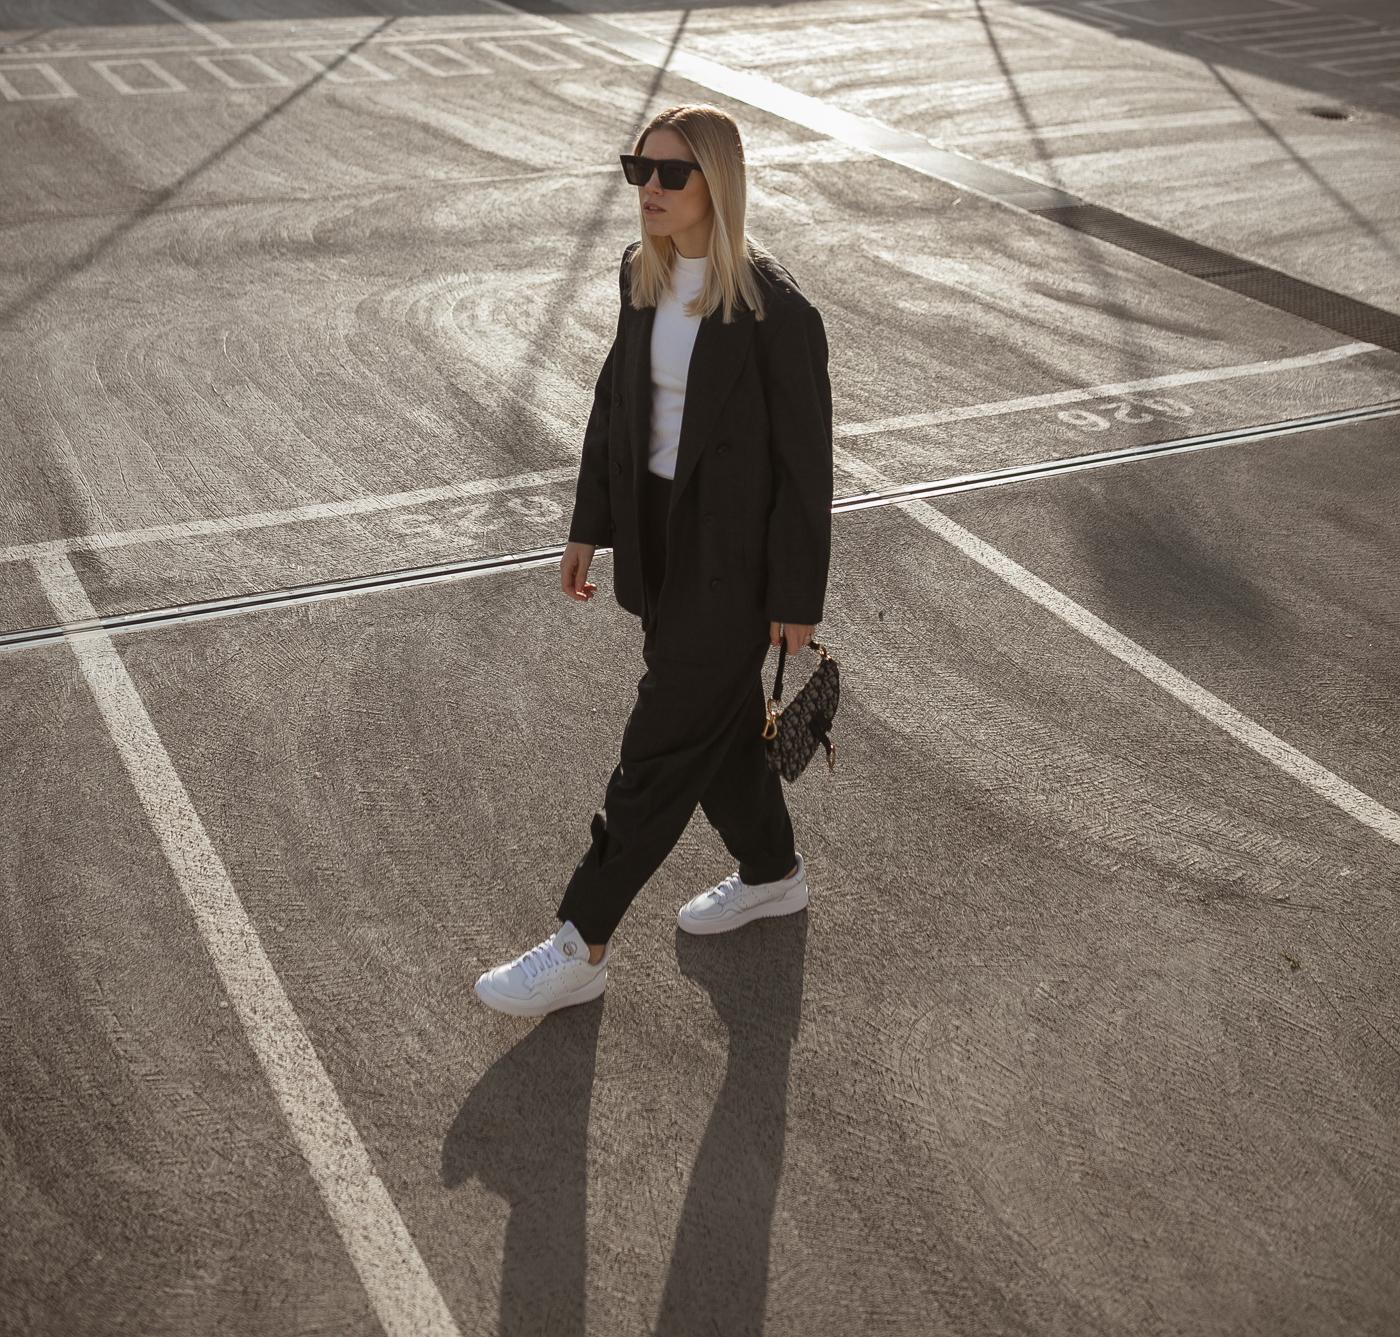 Sneakers-Anzug-modeblog-Düsseldorf-Dior-Saddle-bag